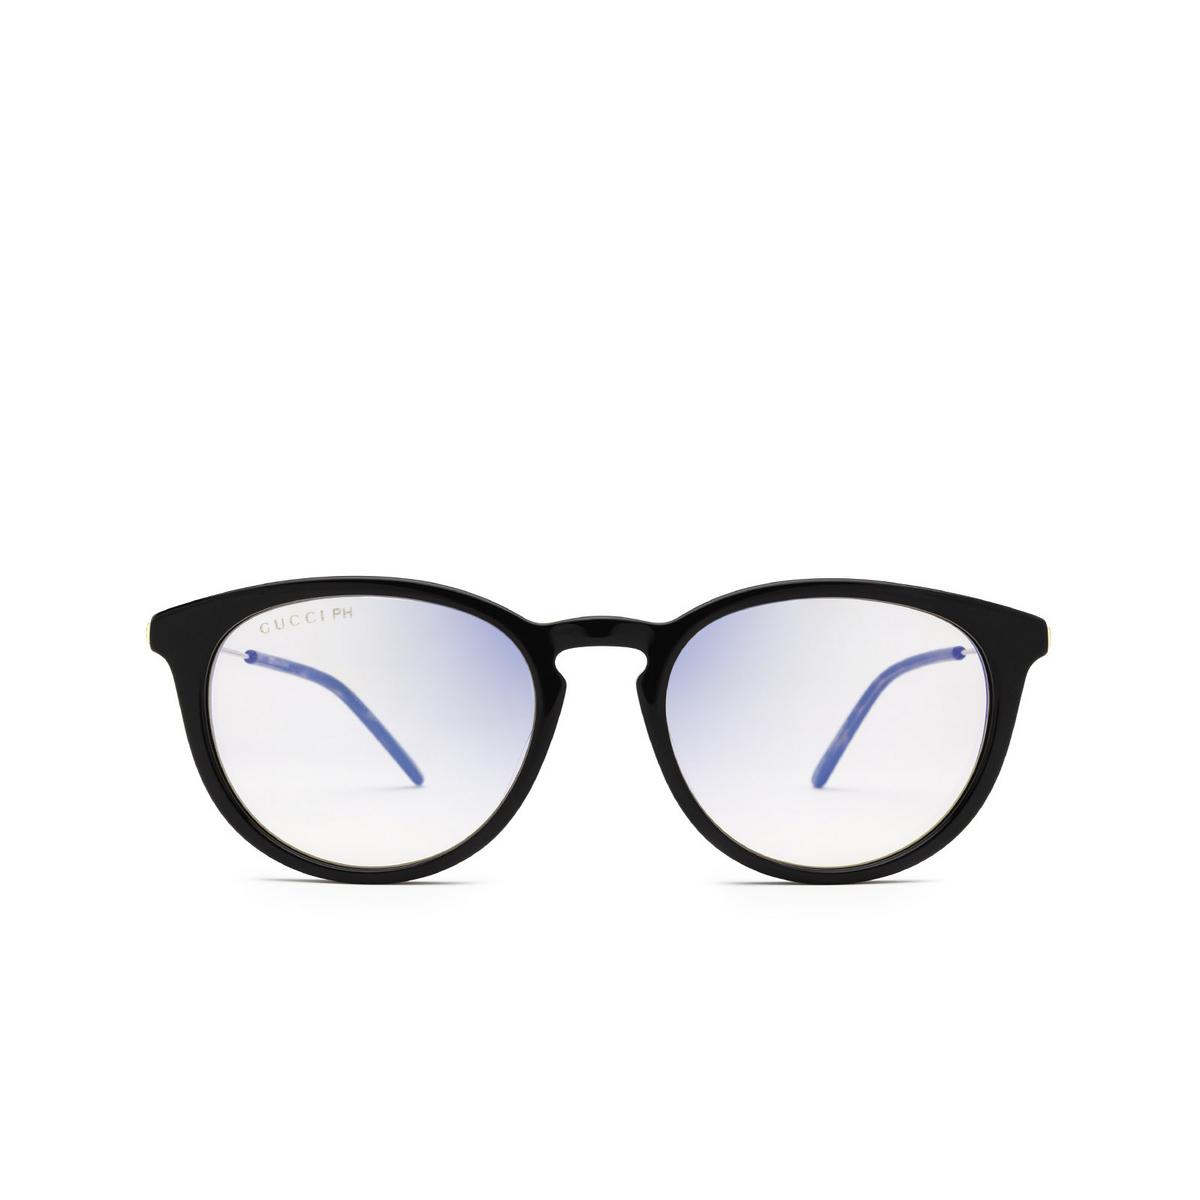 Gucci® Round Sunglasses: GG1048S color Black 005 - front view.